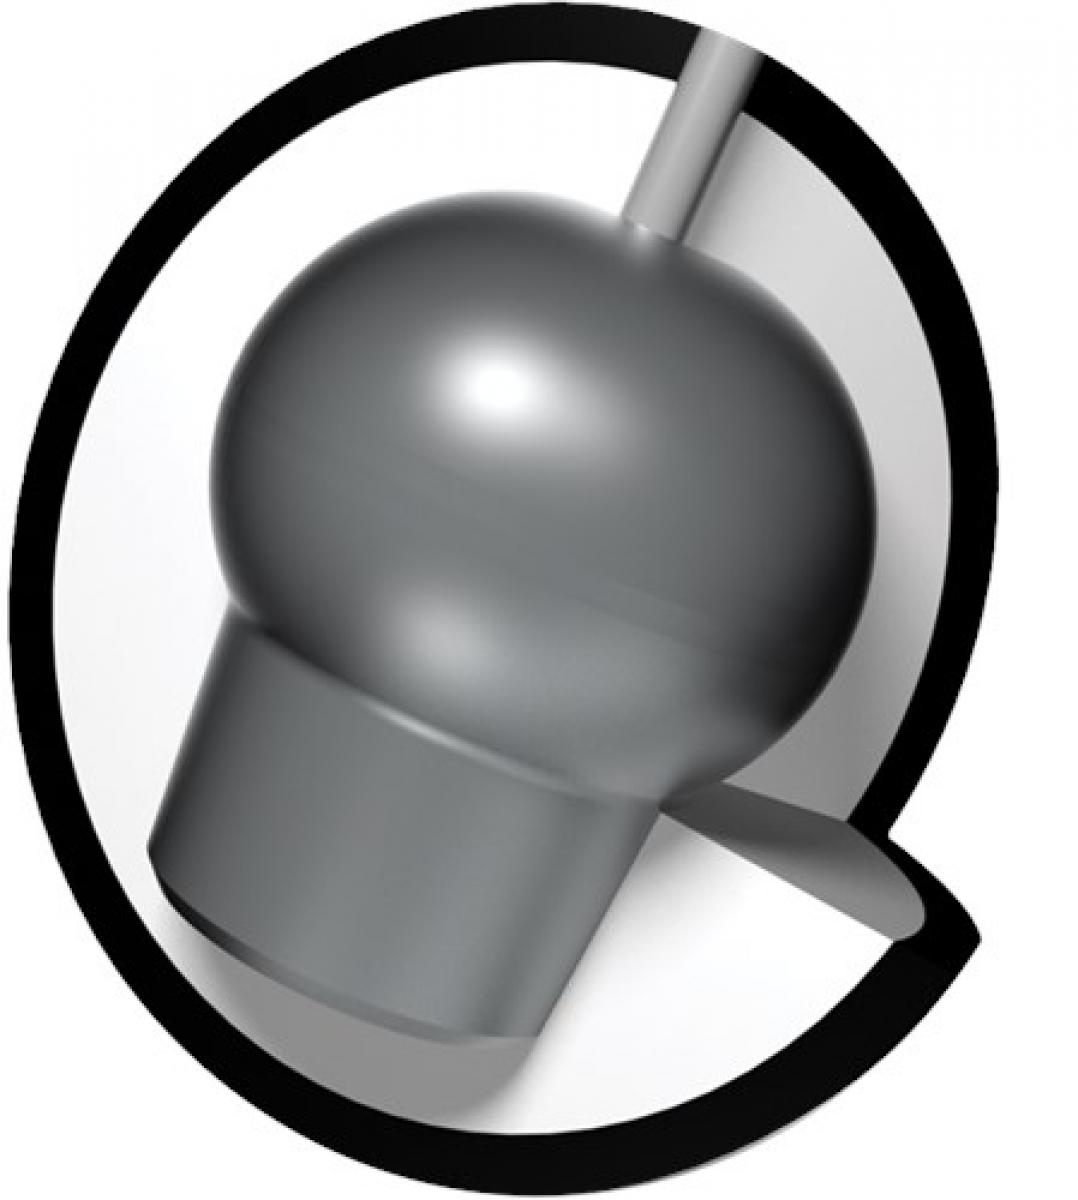 Brunswick Vintage Bowling Ball Reaktiv Danger Zone